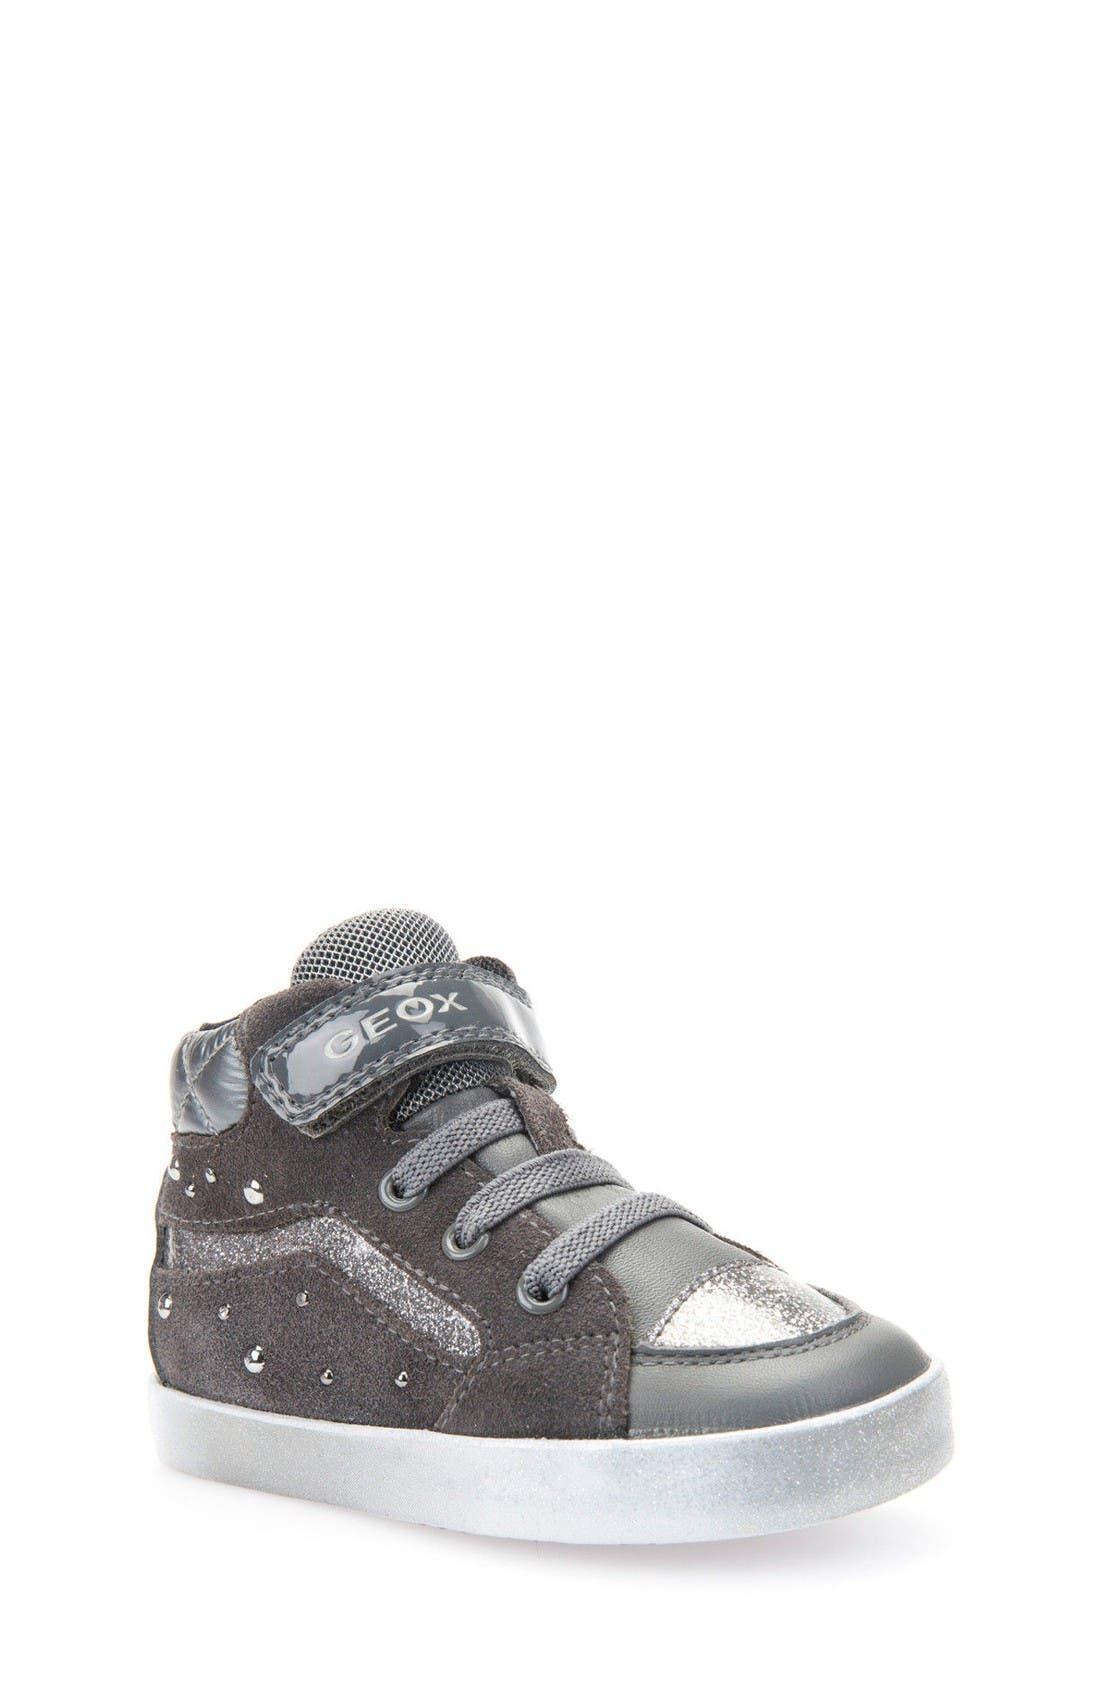 Geox Kiwi Studded High Top Sneaker (Walker & Toddler)